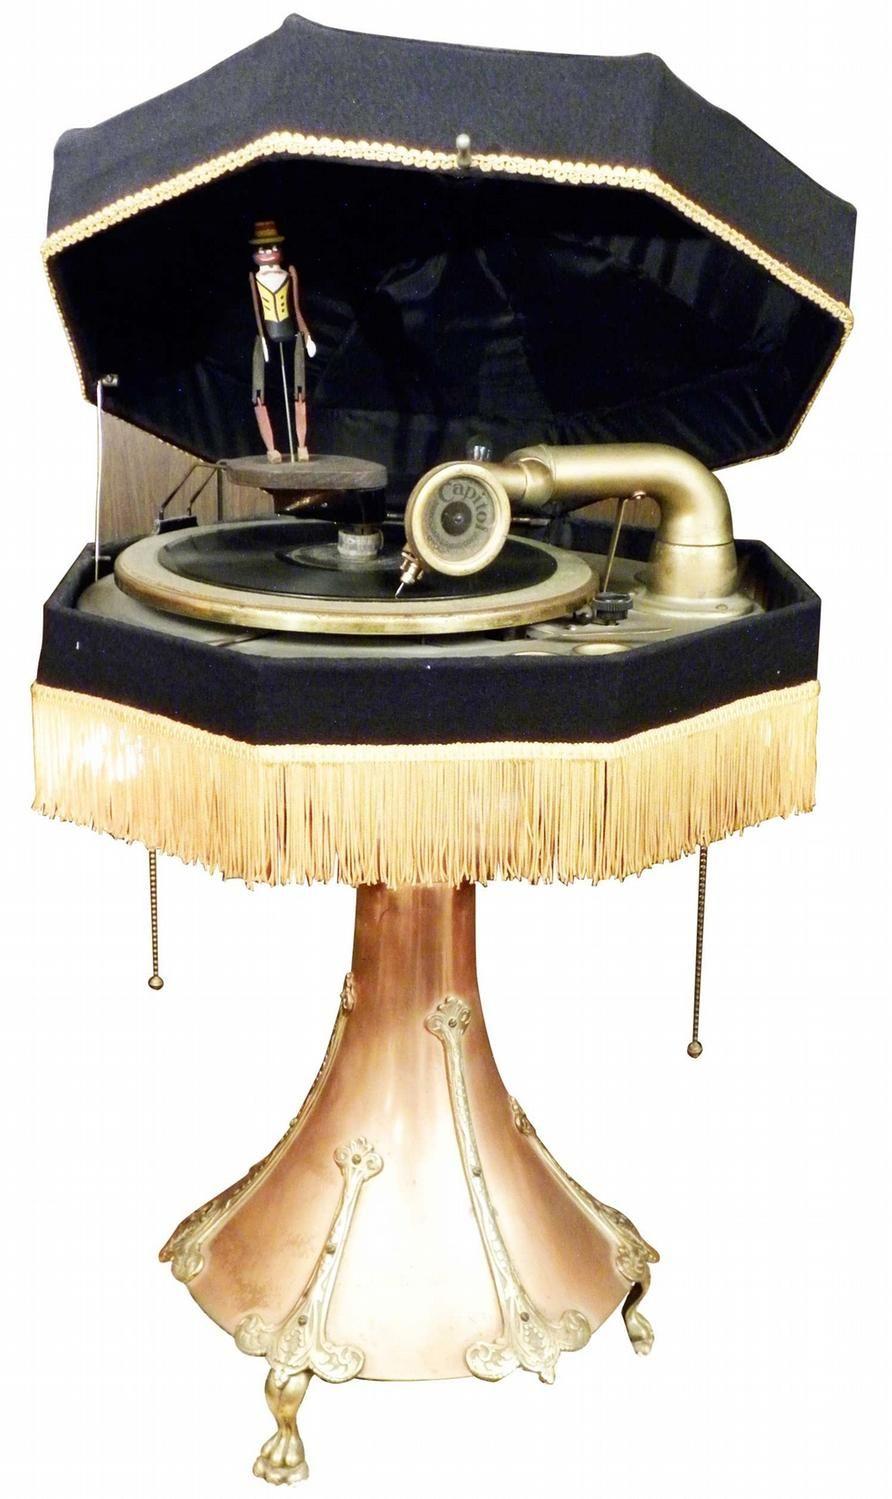 Lampograph? Wow. Light meets music.